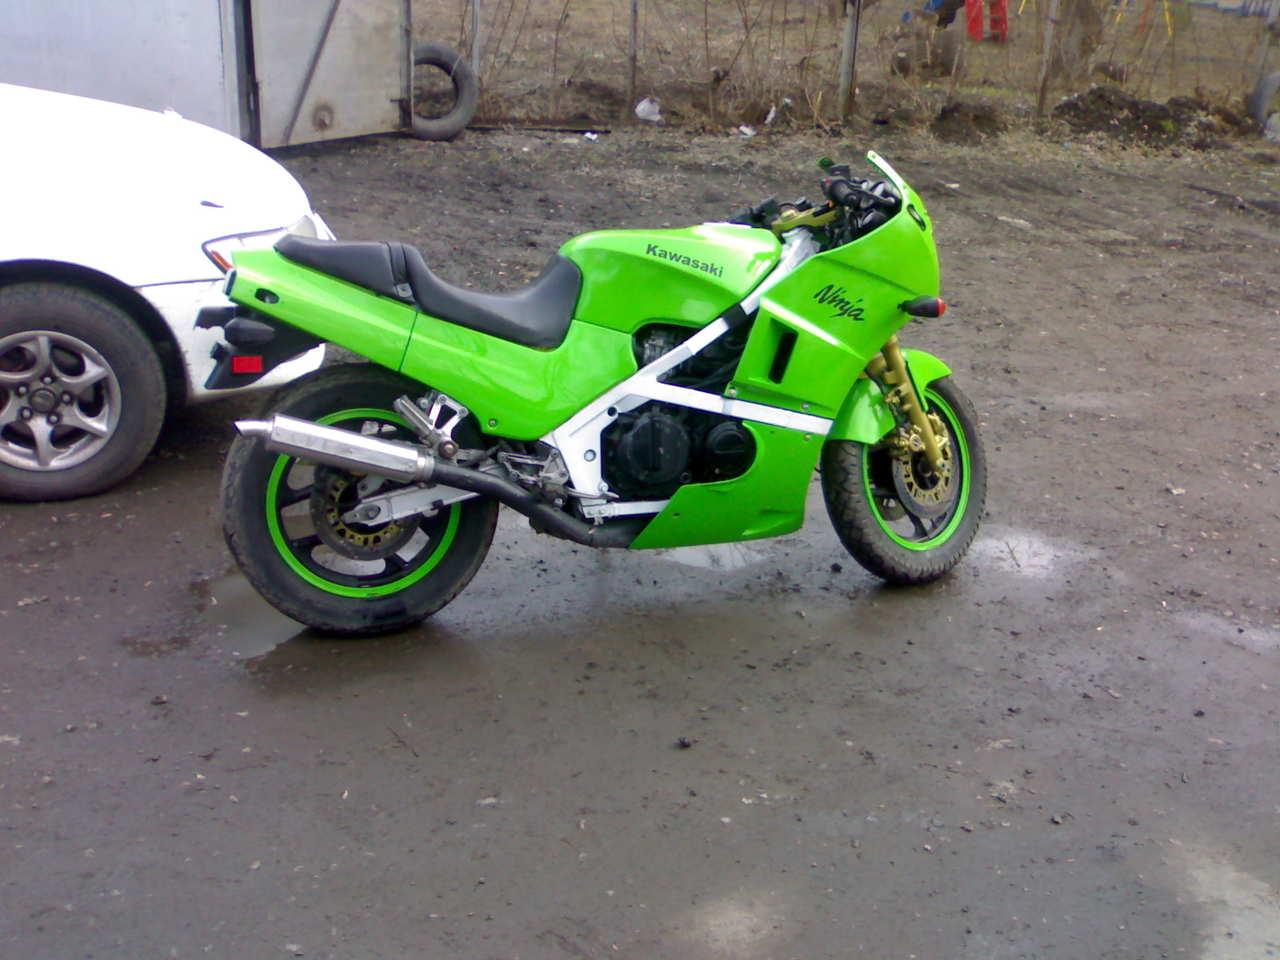 1991 Kawasaki Gpz Ninja Pictures 04l For Sale